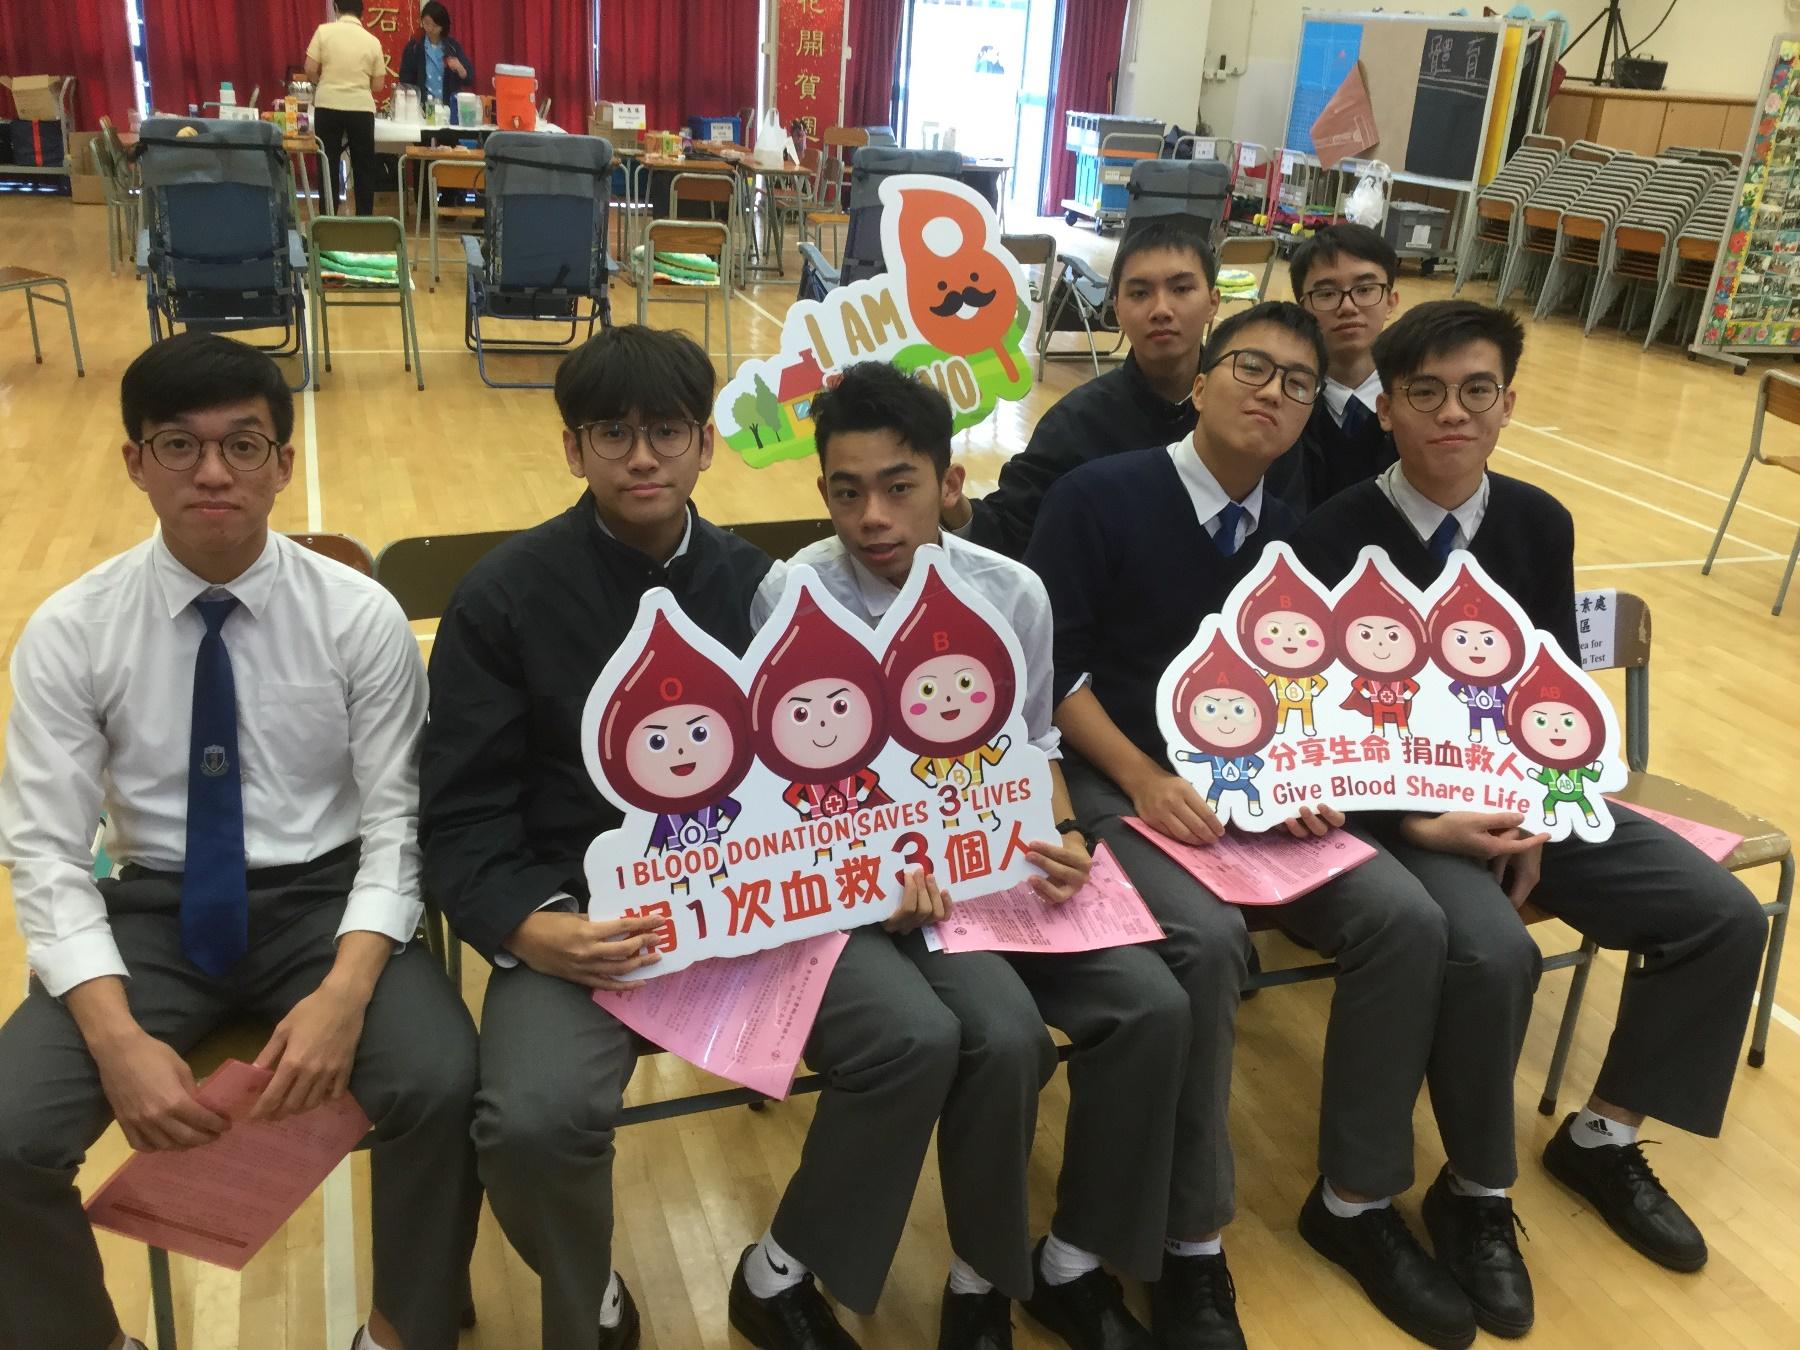 http://npc.edu.hk/sites/default/files/img_2497.jpg